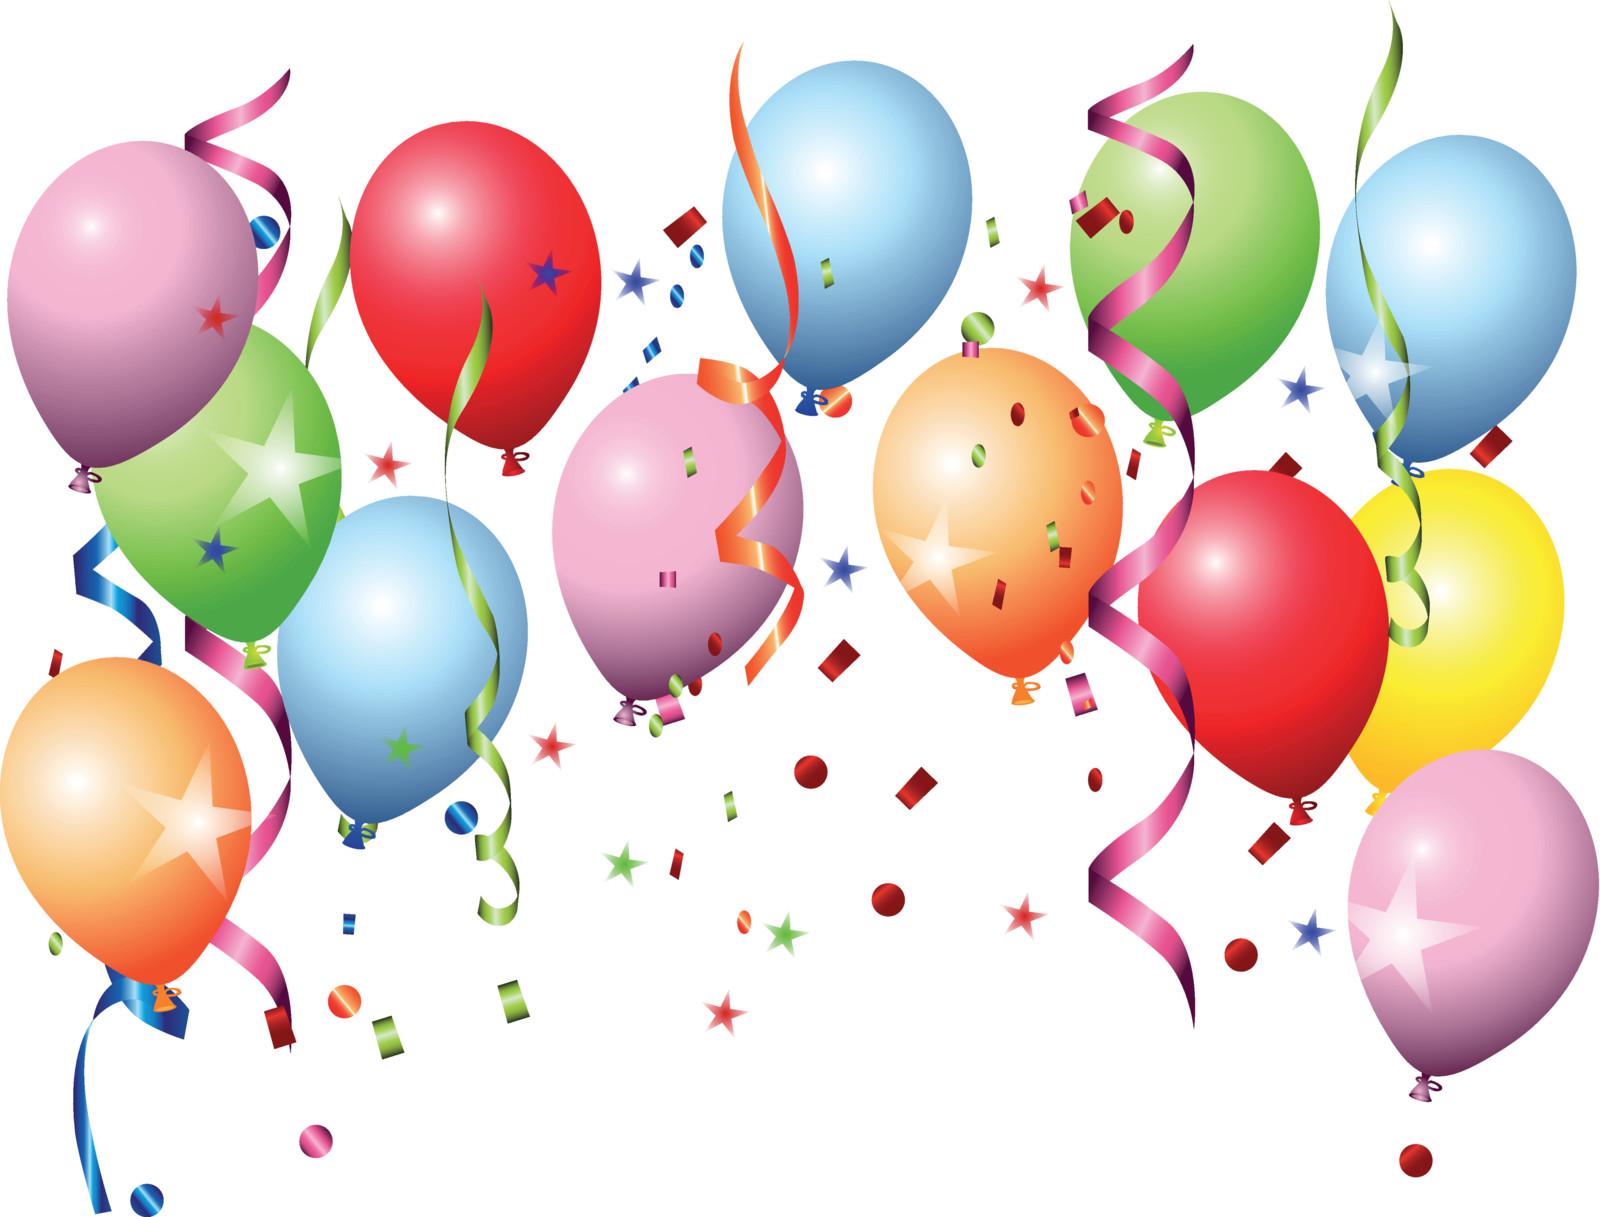 Happy Birthday Balloons- Doug Gazlay's ILoveVittles.com